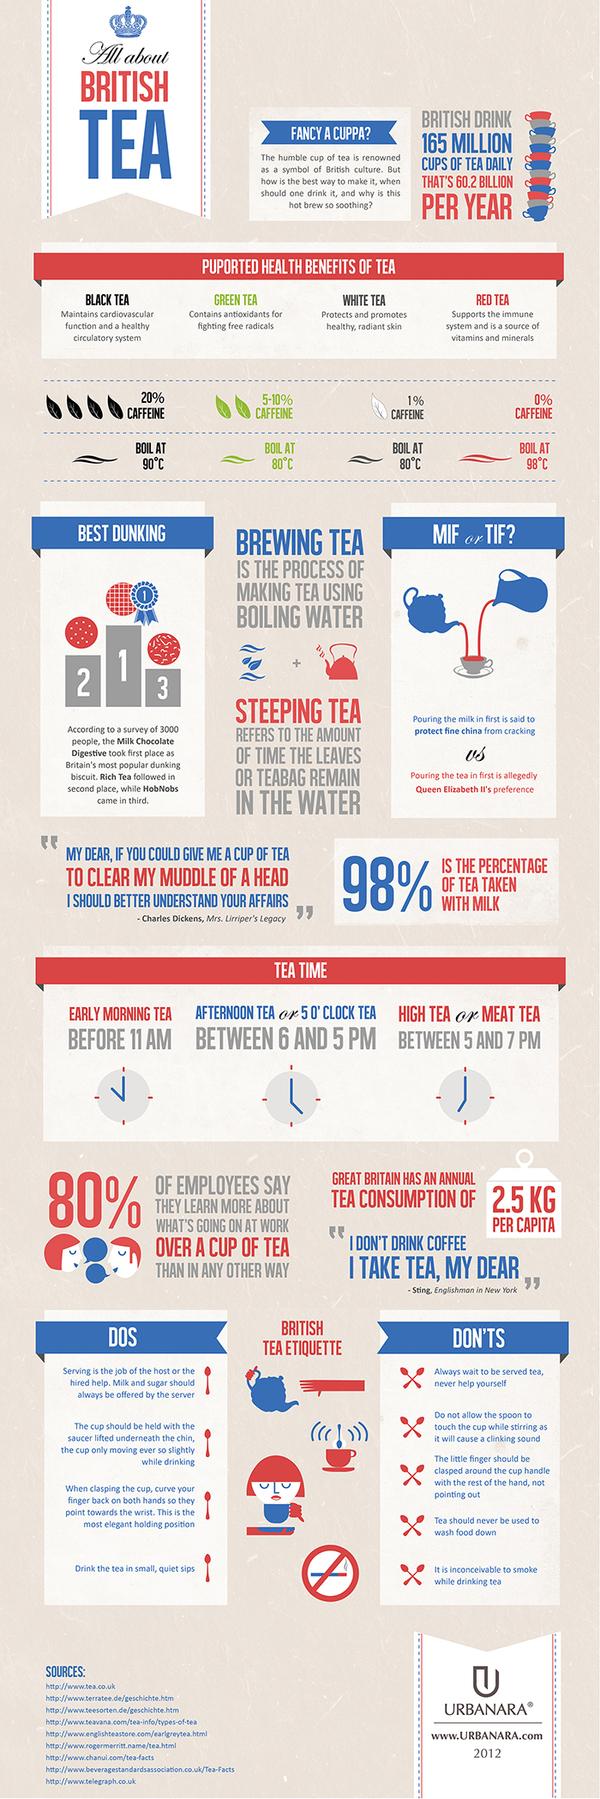 Infographic - British Tea by Patrícia Mafra, via Behance